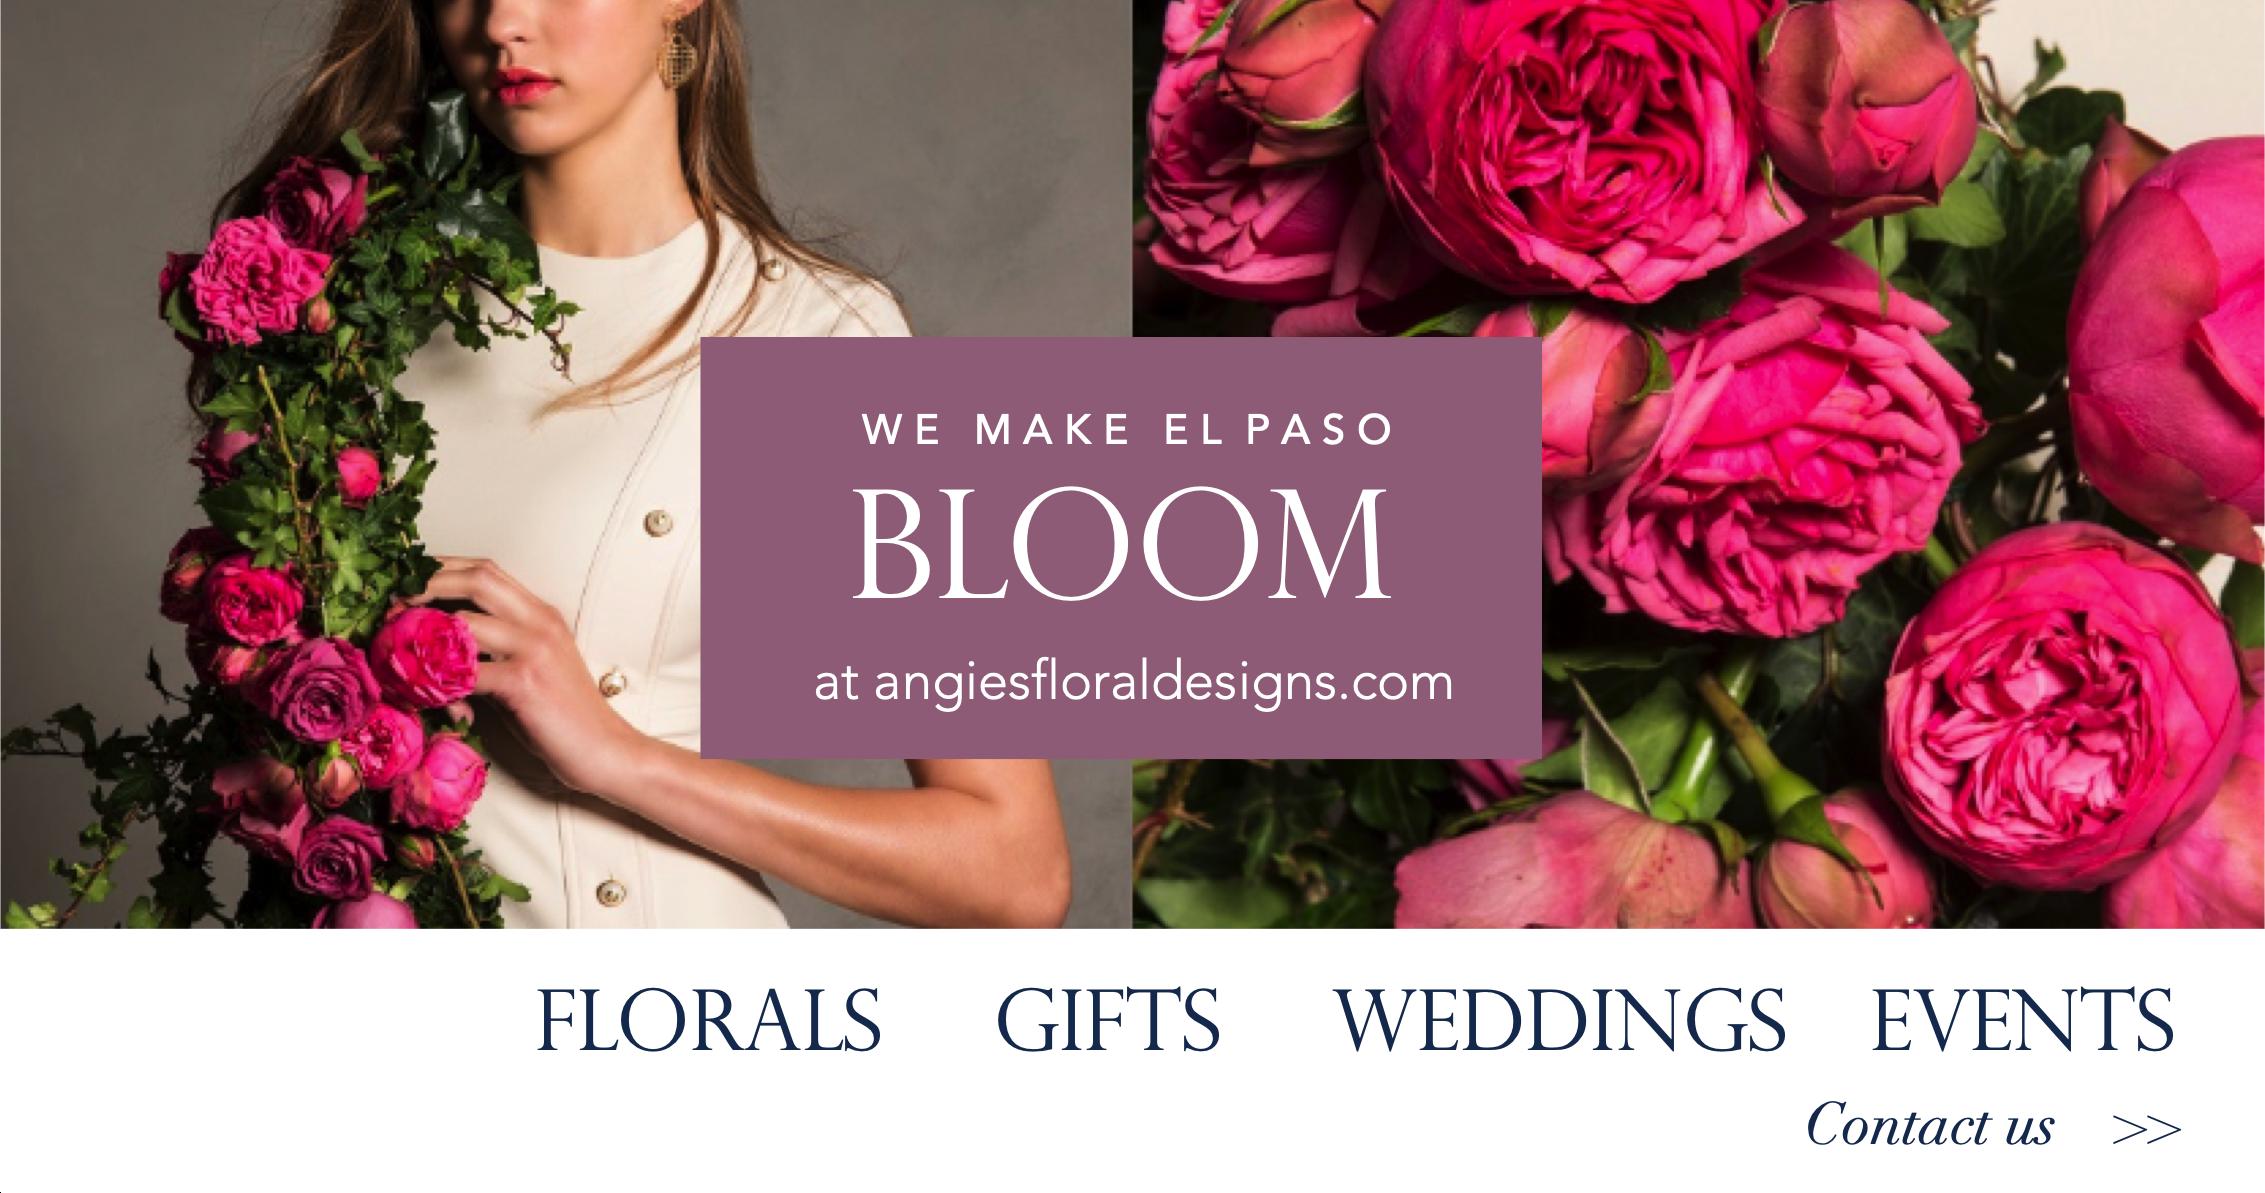 1bloom-with-us-angies-floral-designs-el-paso-florist-flowershop-tx-.png